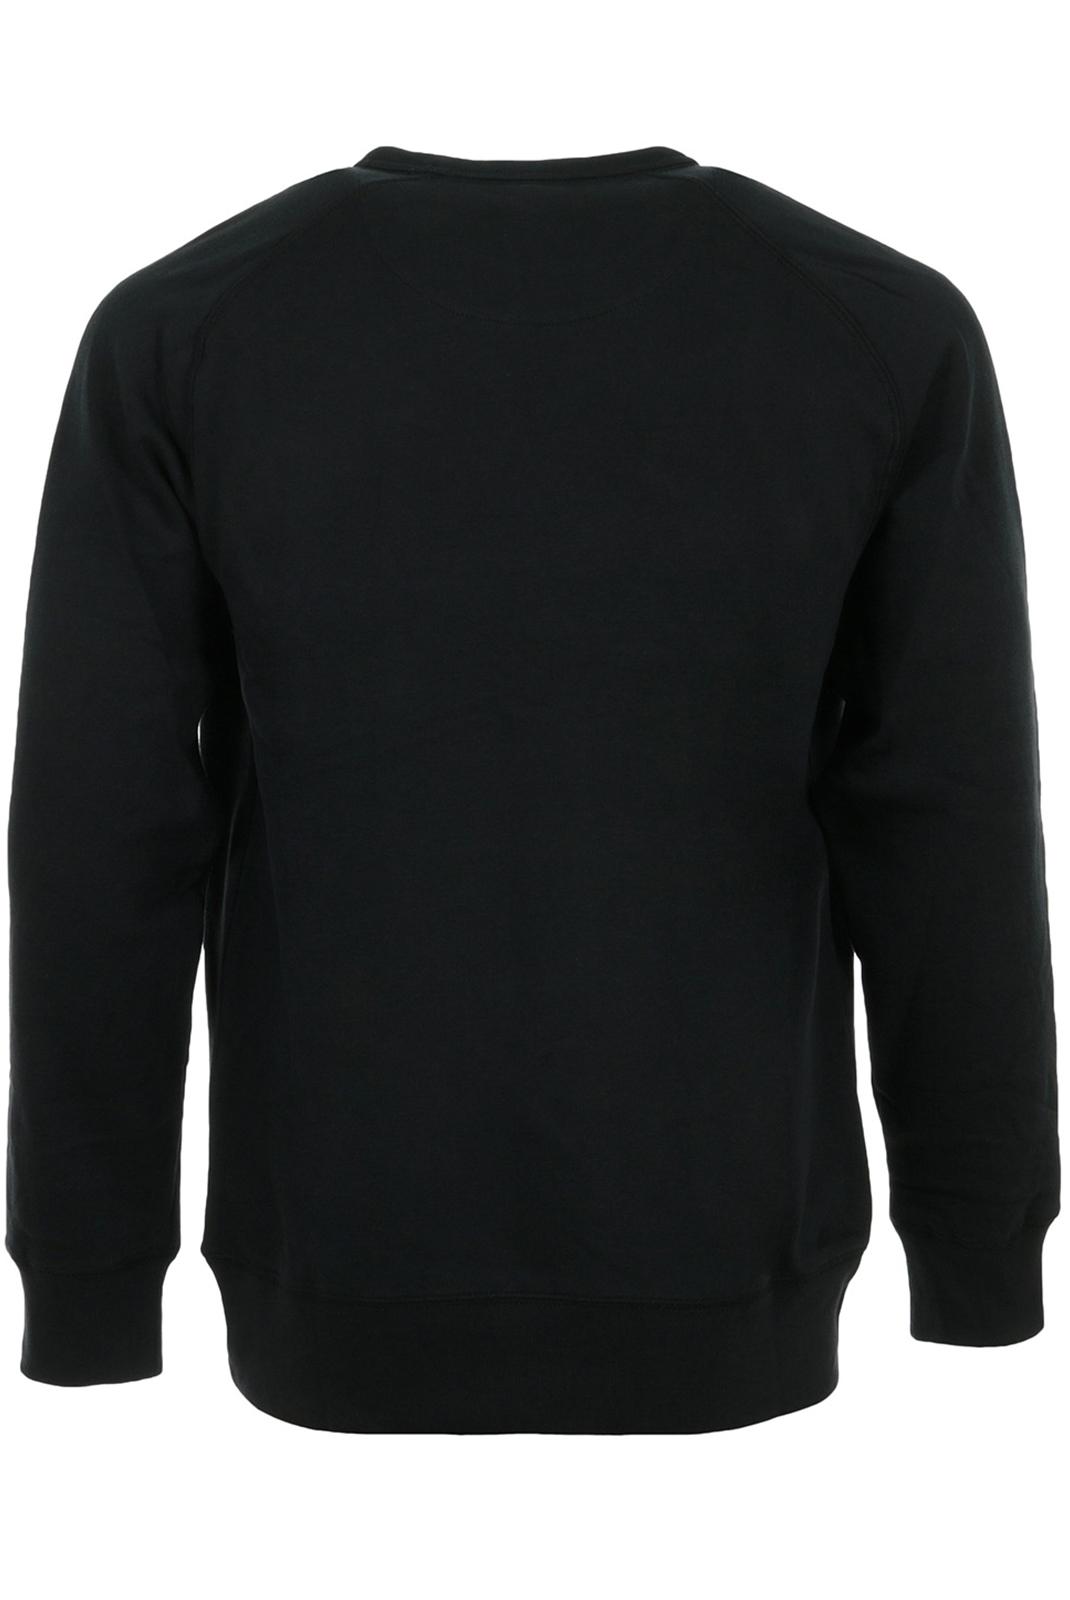 Sweatshirts  Ellesse EH H CREW NECK UNI BLACK